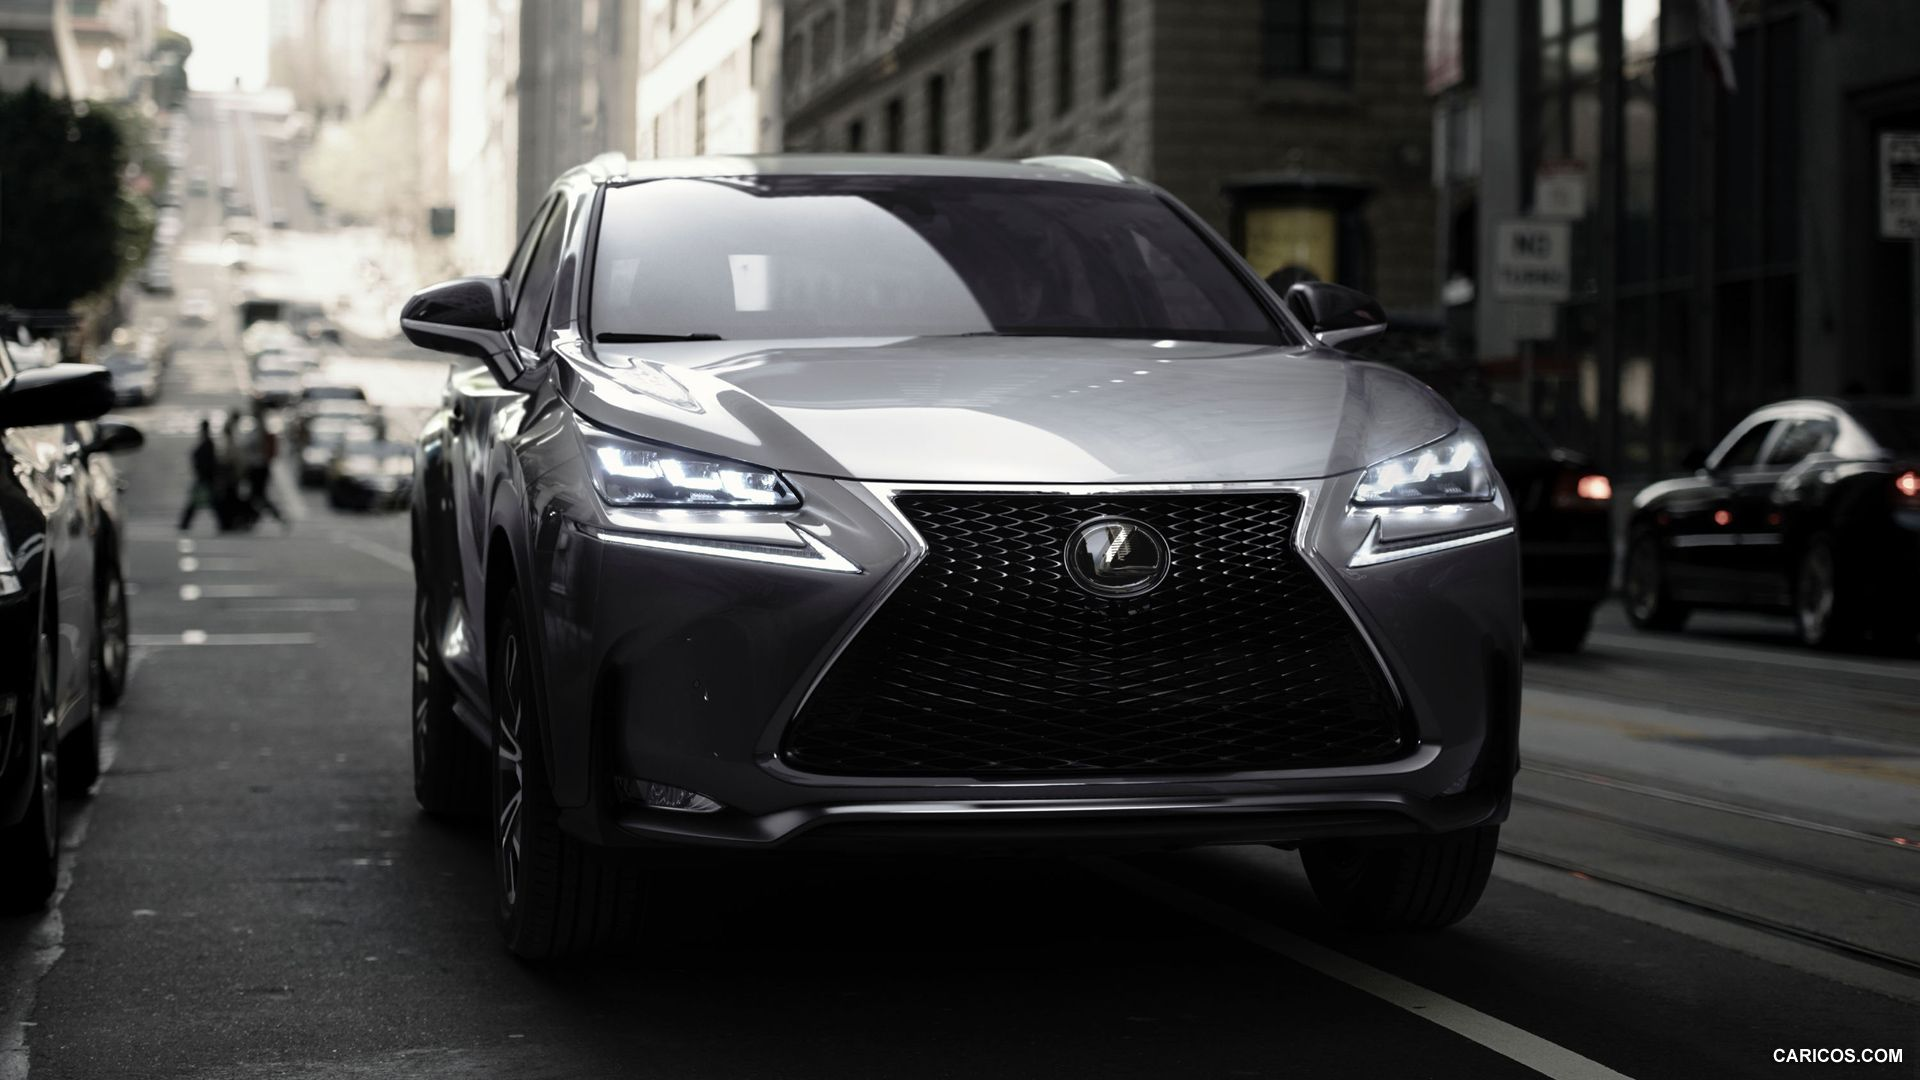 2015 Lexus NX 200t F SPORT Lexus cars, Lexus dealership